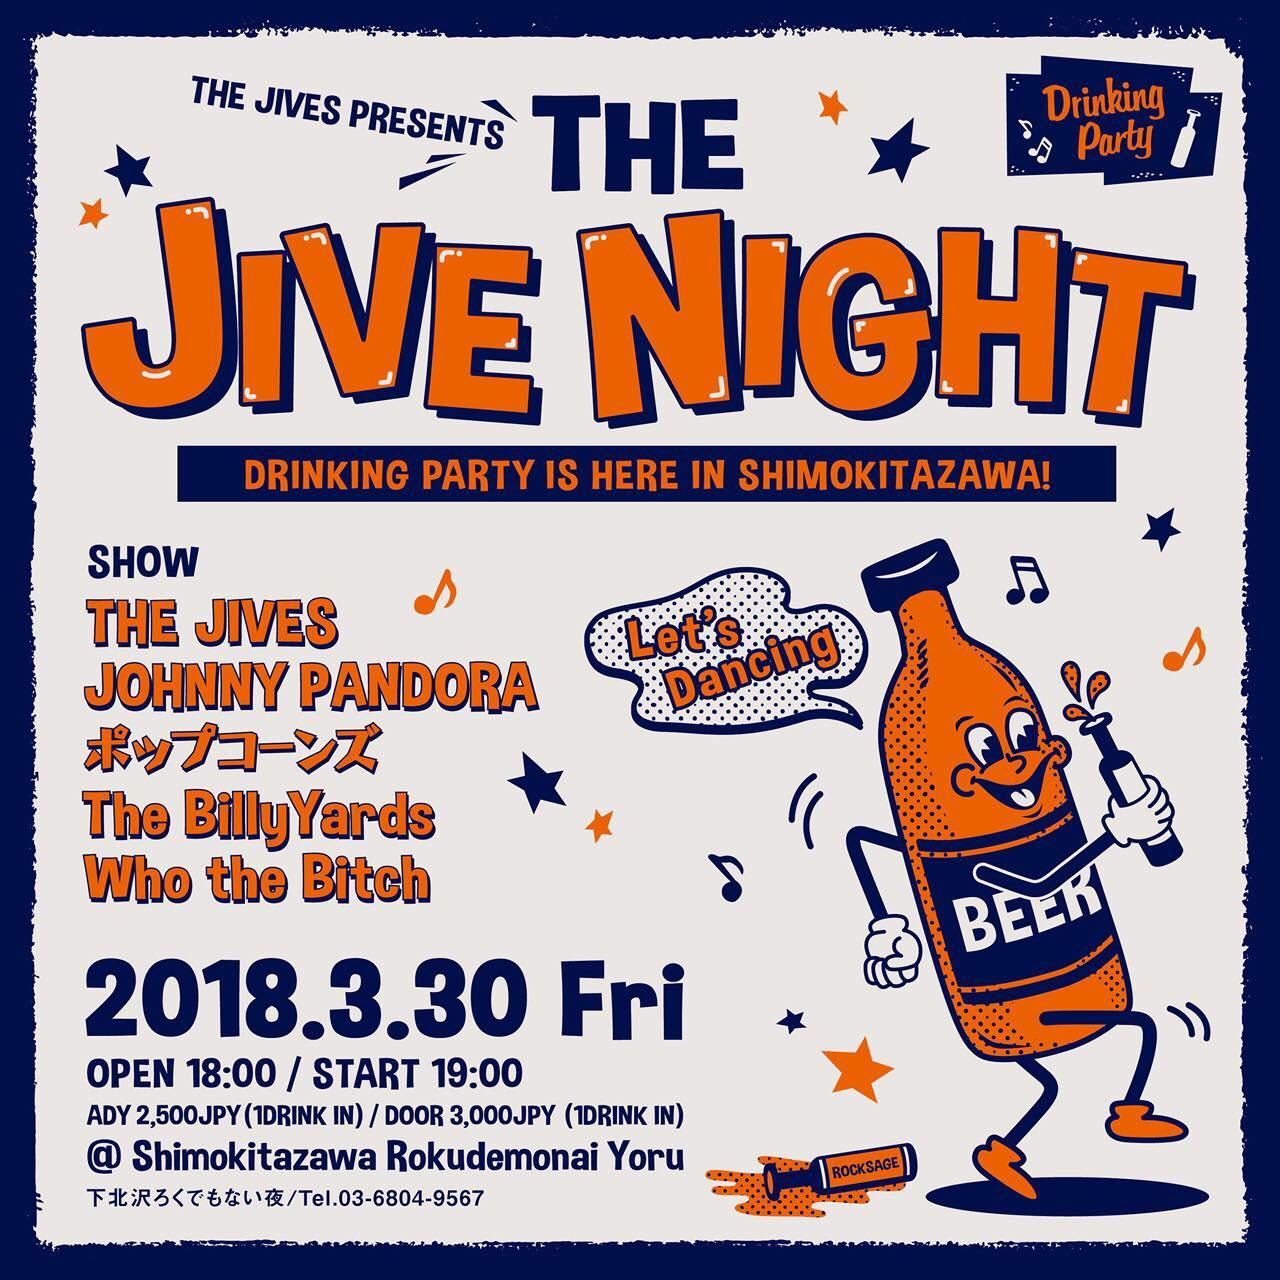 THE JIVE NIGHT フライヤー1